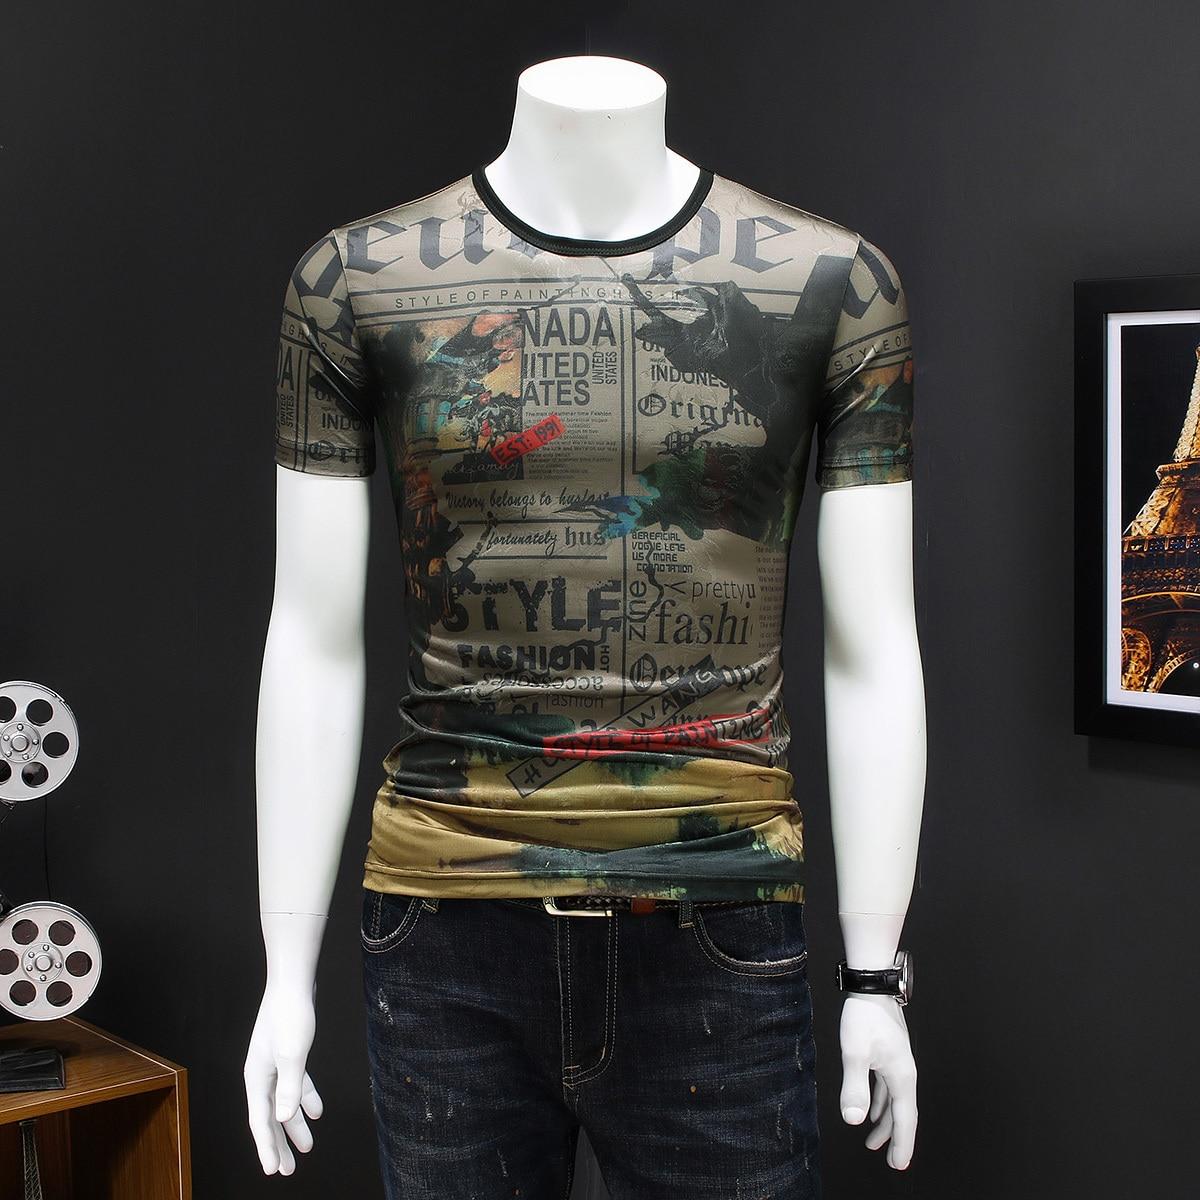 Personality Print Tshirt Man Club Party Summer Streetwear T-shirt Fashion Homme Hombre Camiseta Hombre Manga Corta Short Tee